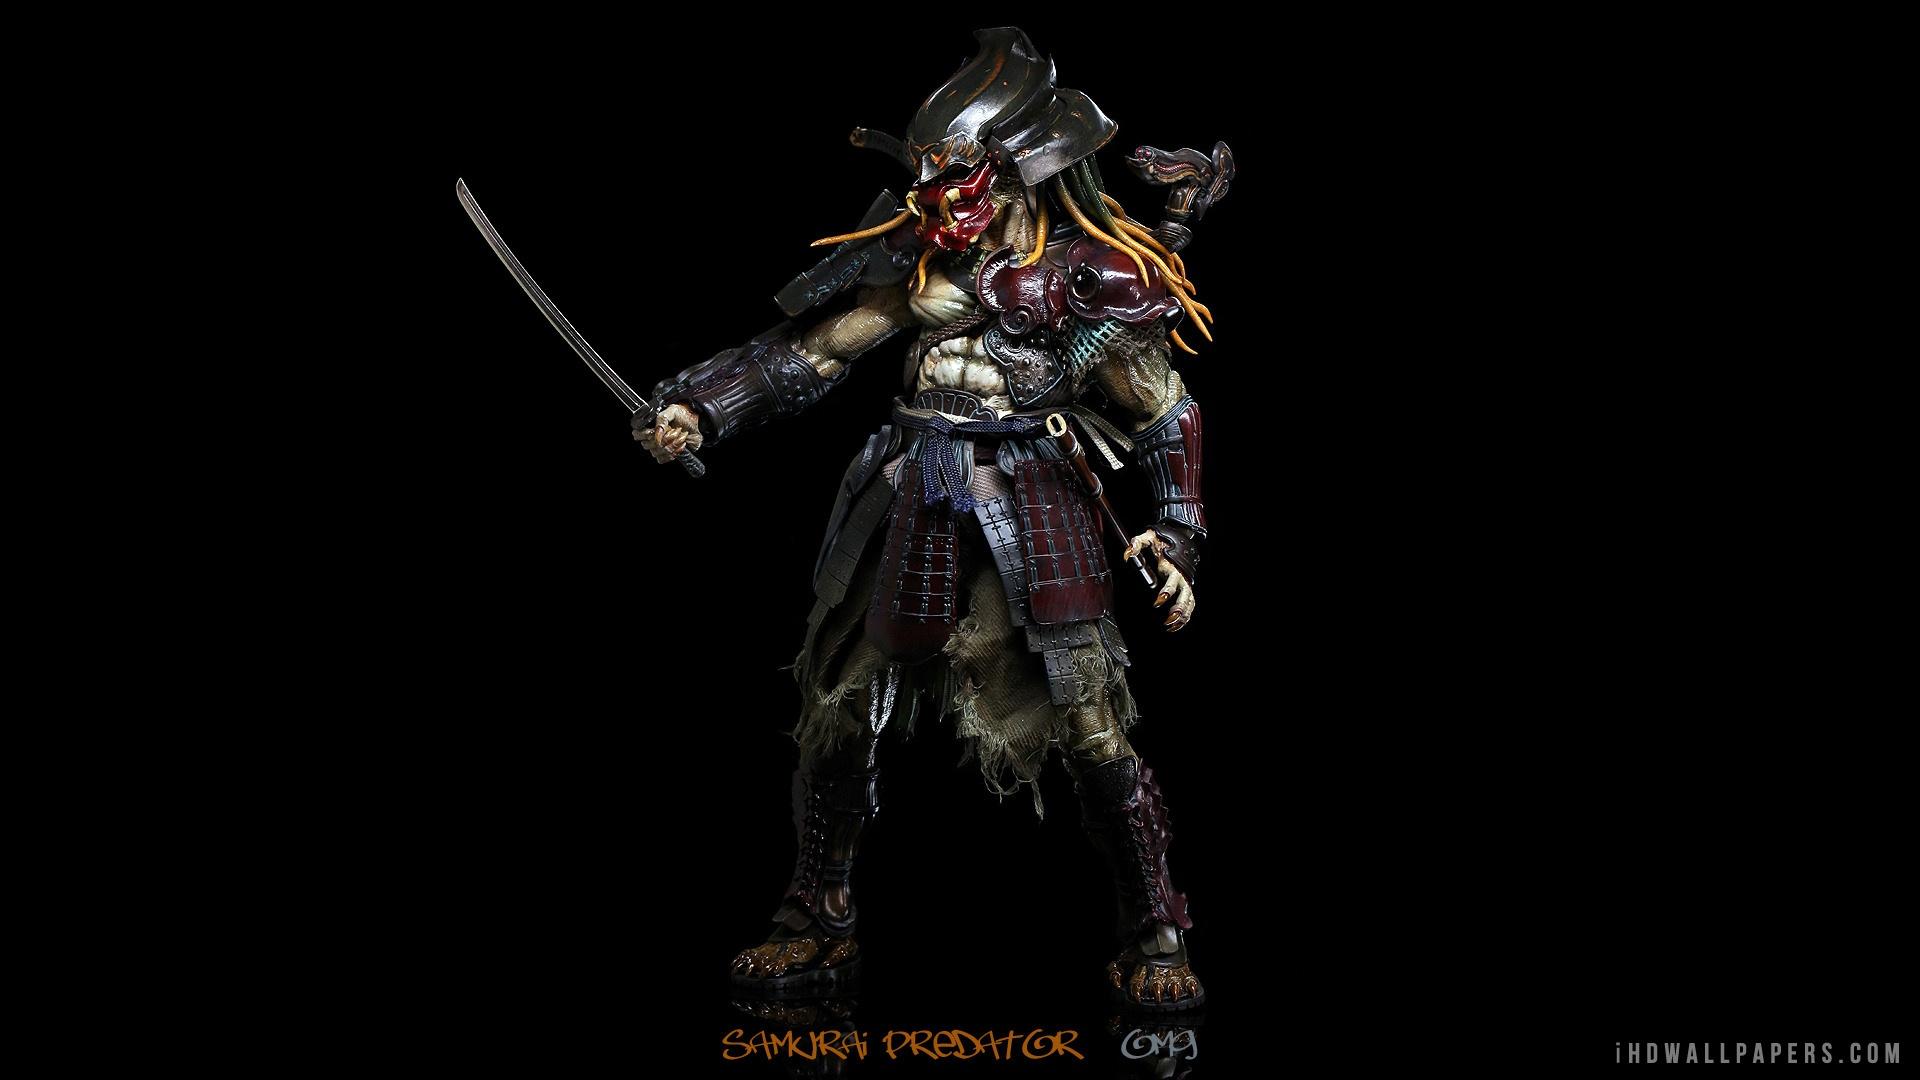 Samurai Predator 4 HD Wallpaper   iHD Wallpapers 1920x1080